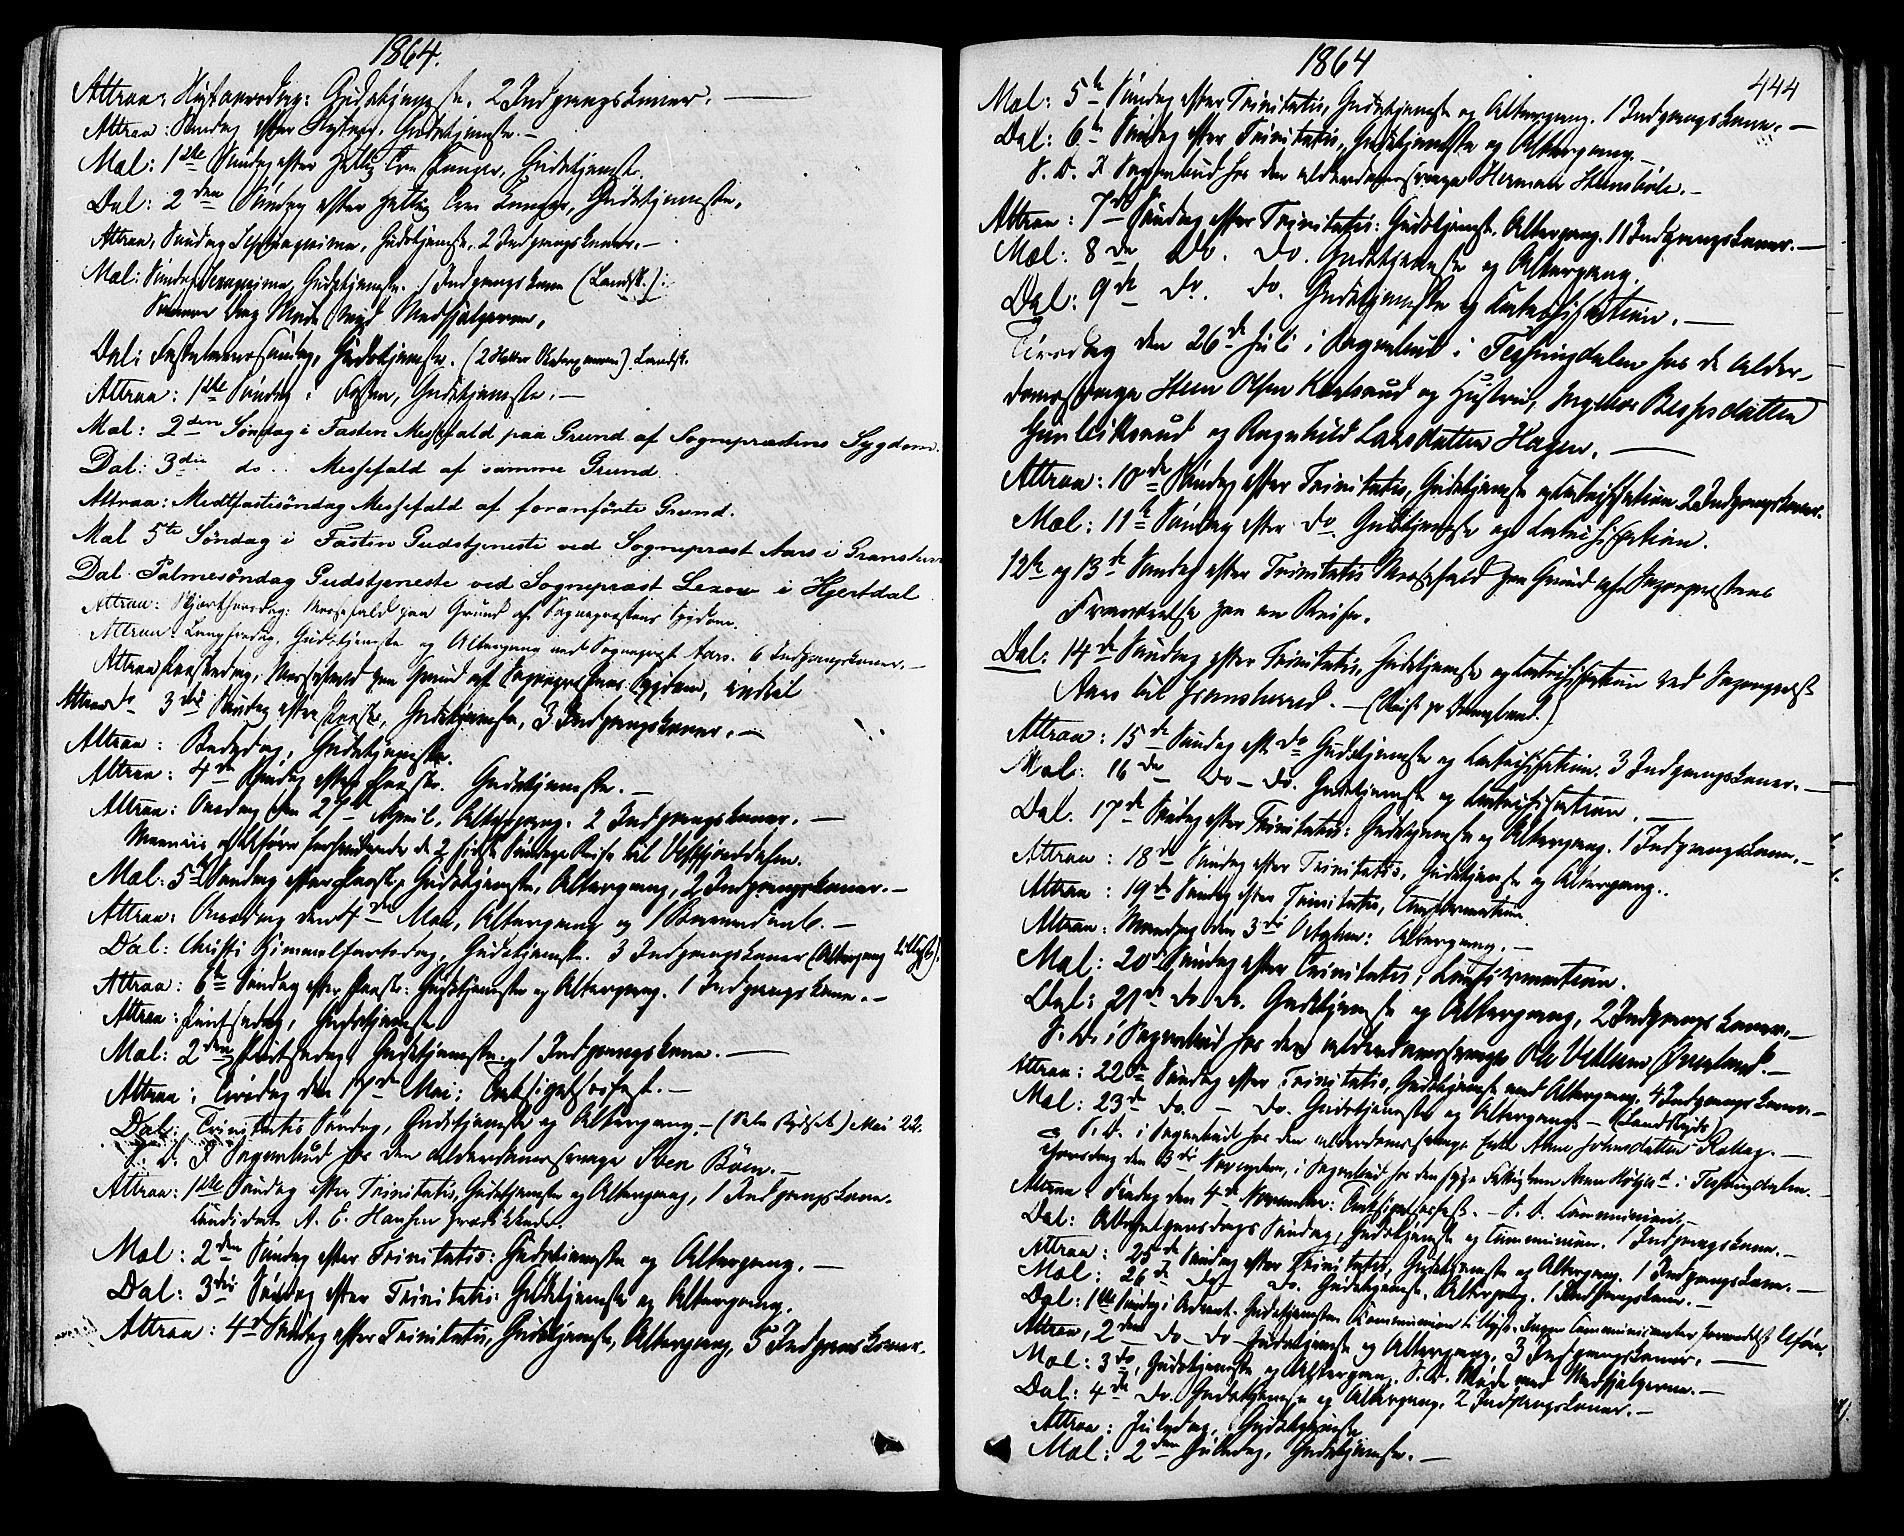 SAKO, Tinn kirkebøker, F/Fa/L0006: Ministerialbok nr. I 6, 1857-1878, s. 444